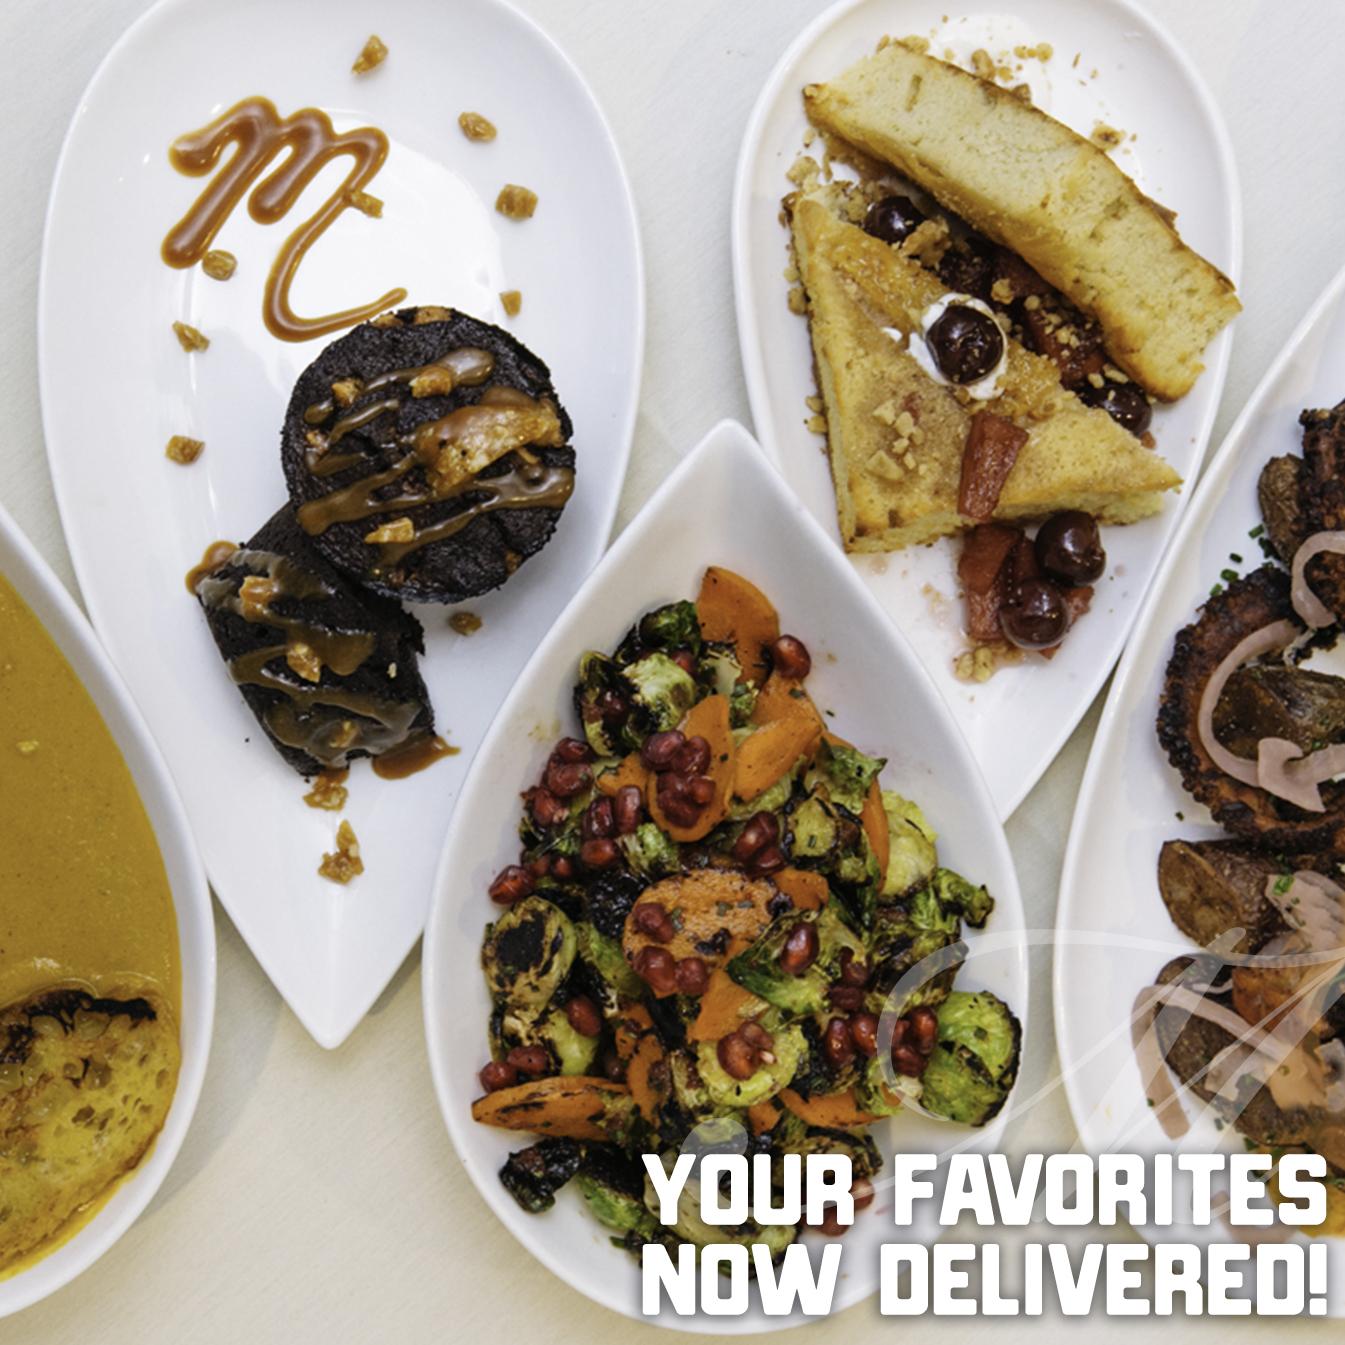 YourFavorites-Caviar.jpg